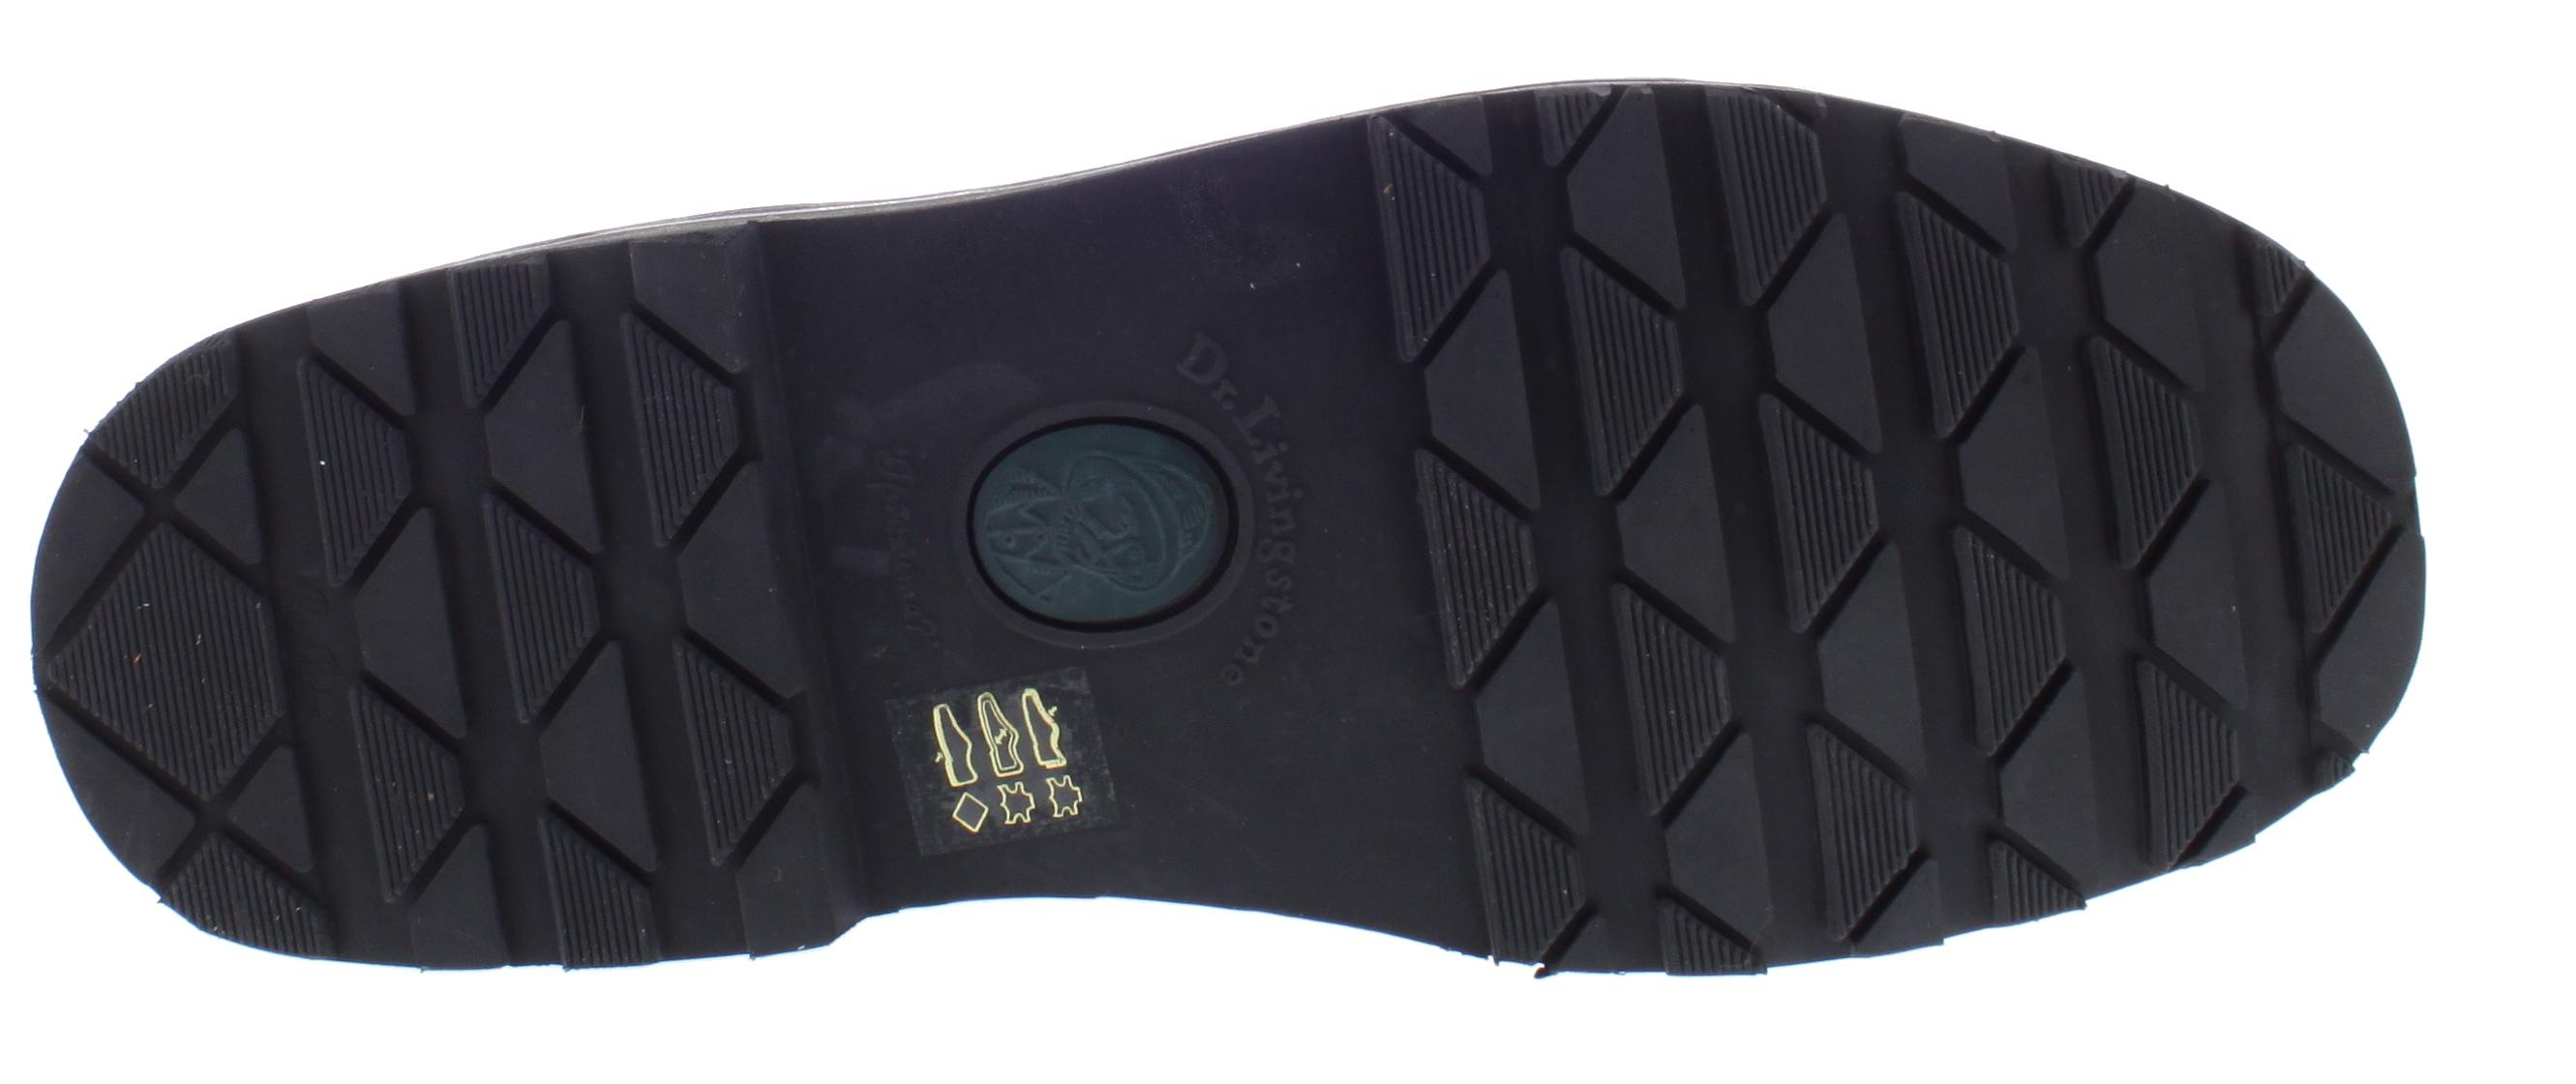 4895-9800